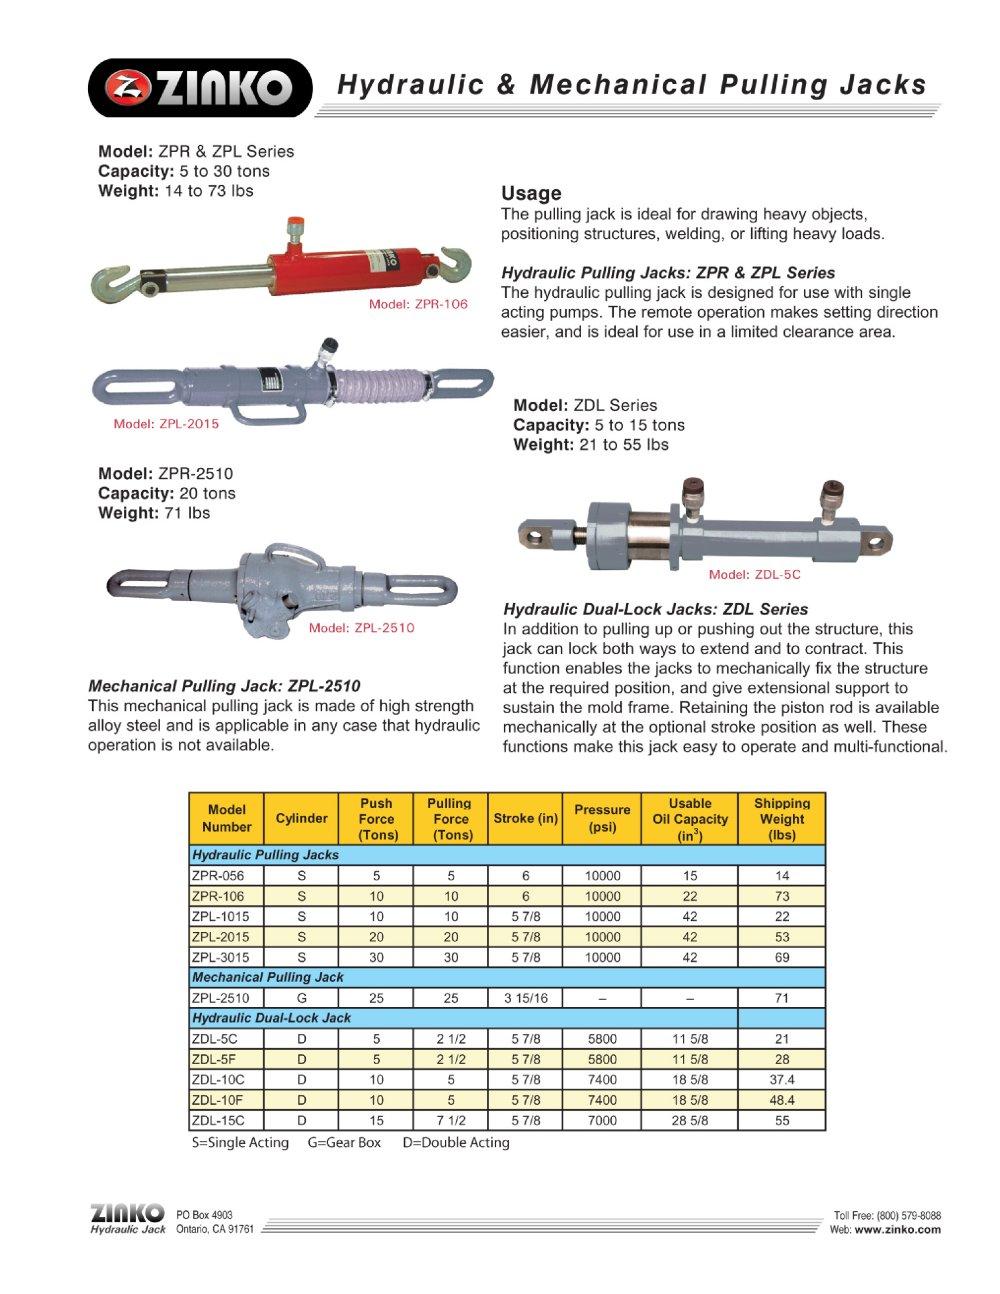 Hydraulic Jack Diagram Pdf Electrical Wiring Diagrams Ton Floor Parts Pulling Zinko Catalogue Michelin